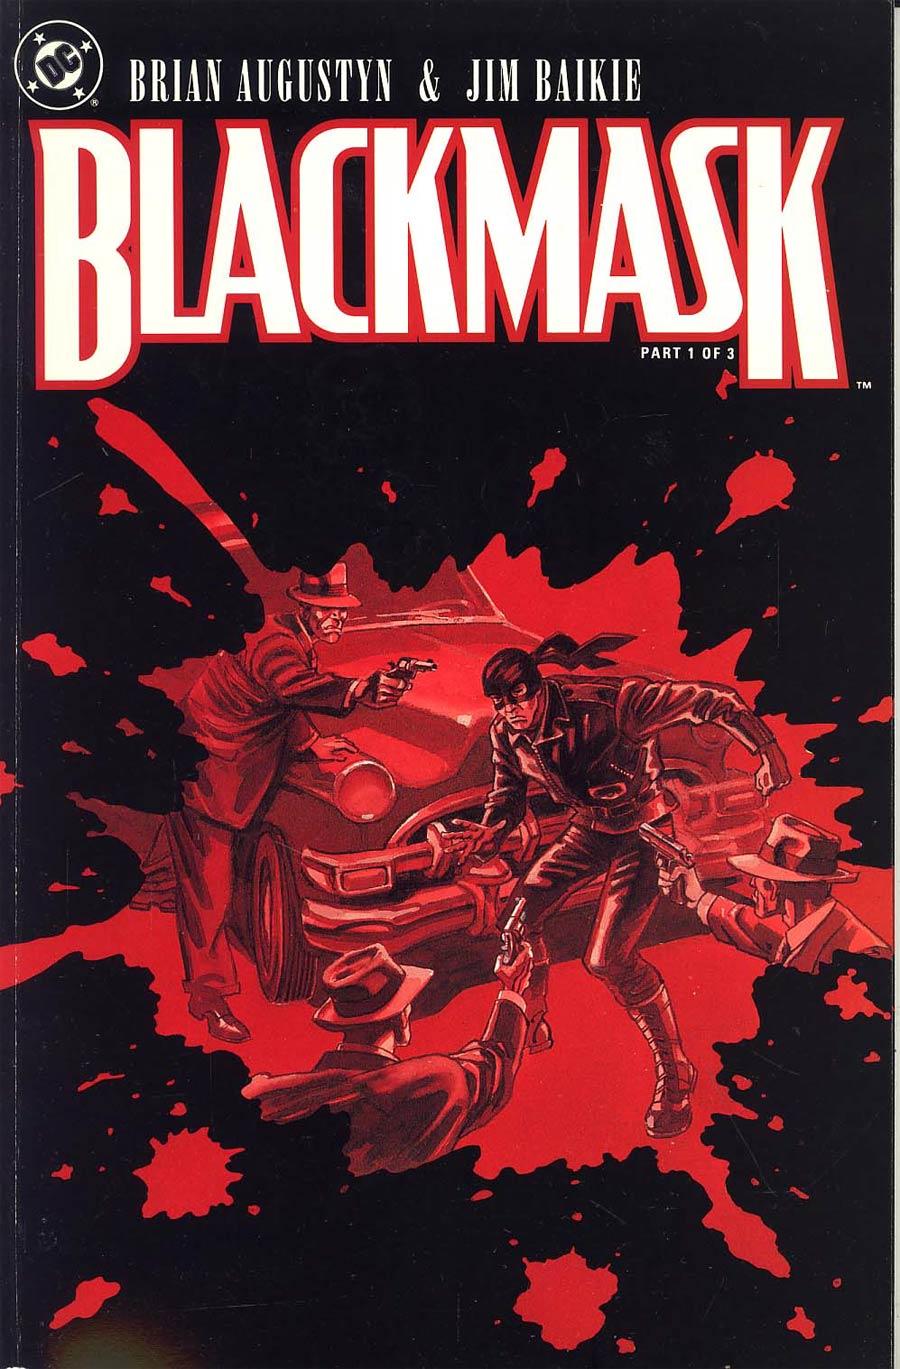 Black Mask #1